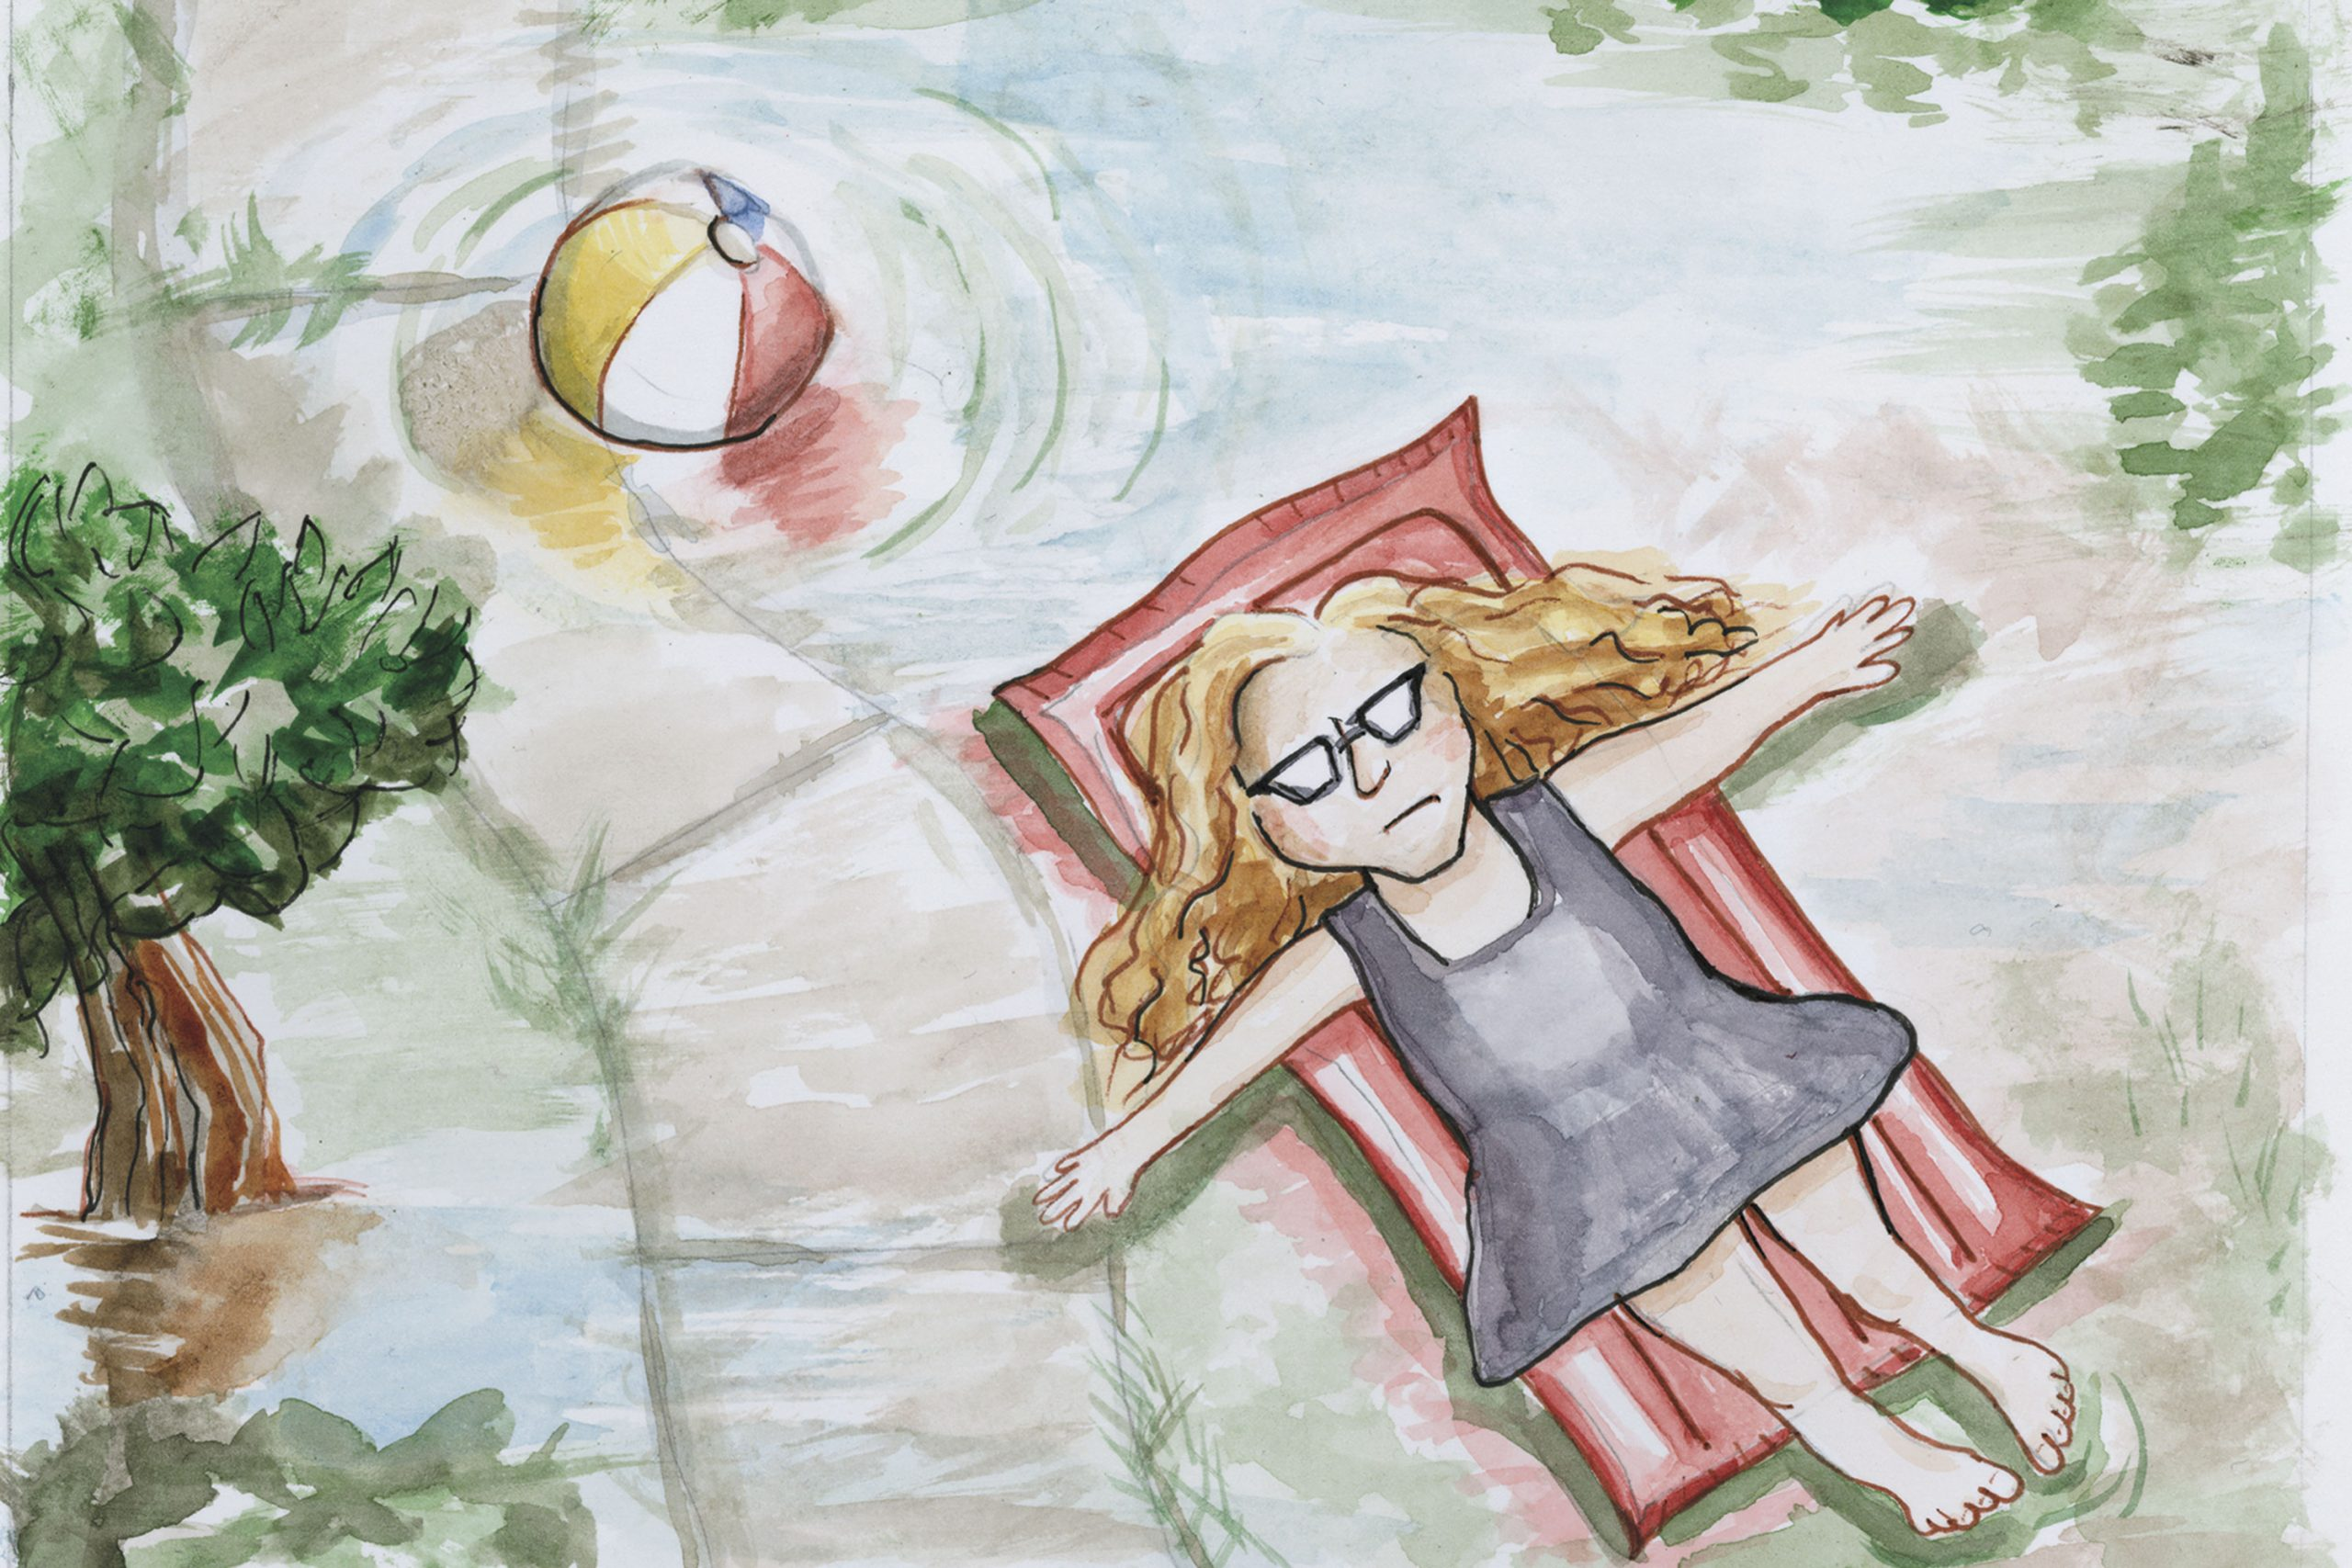 Illustration by Laura Spalding Best